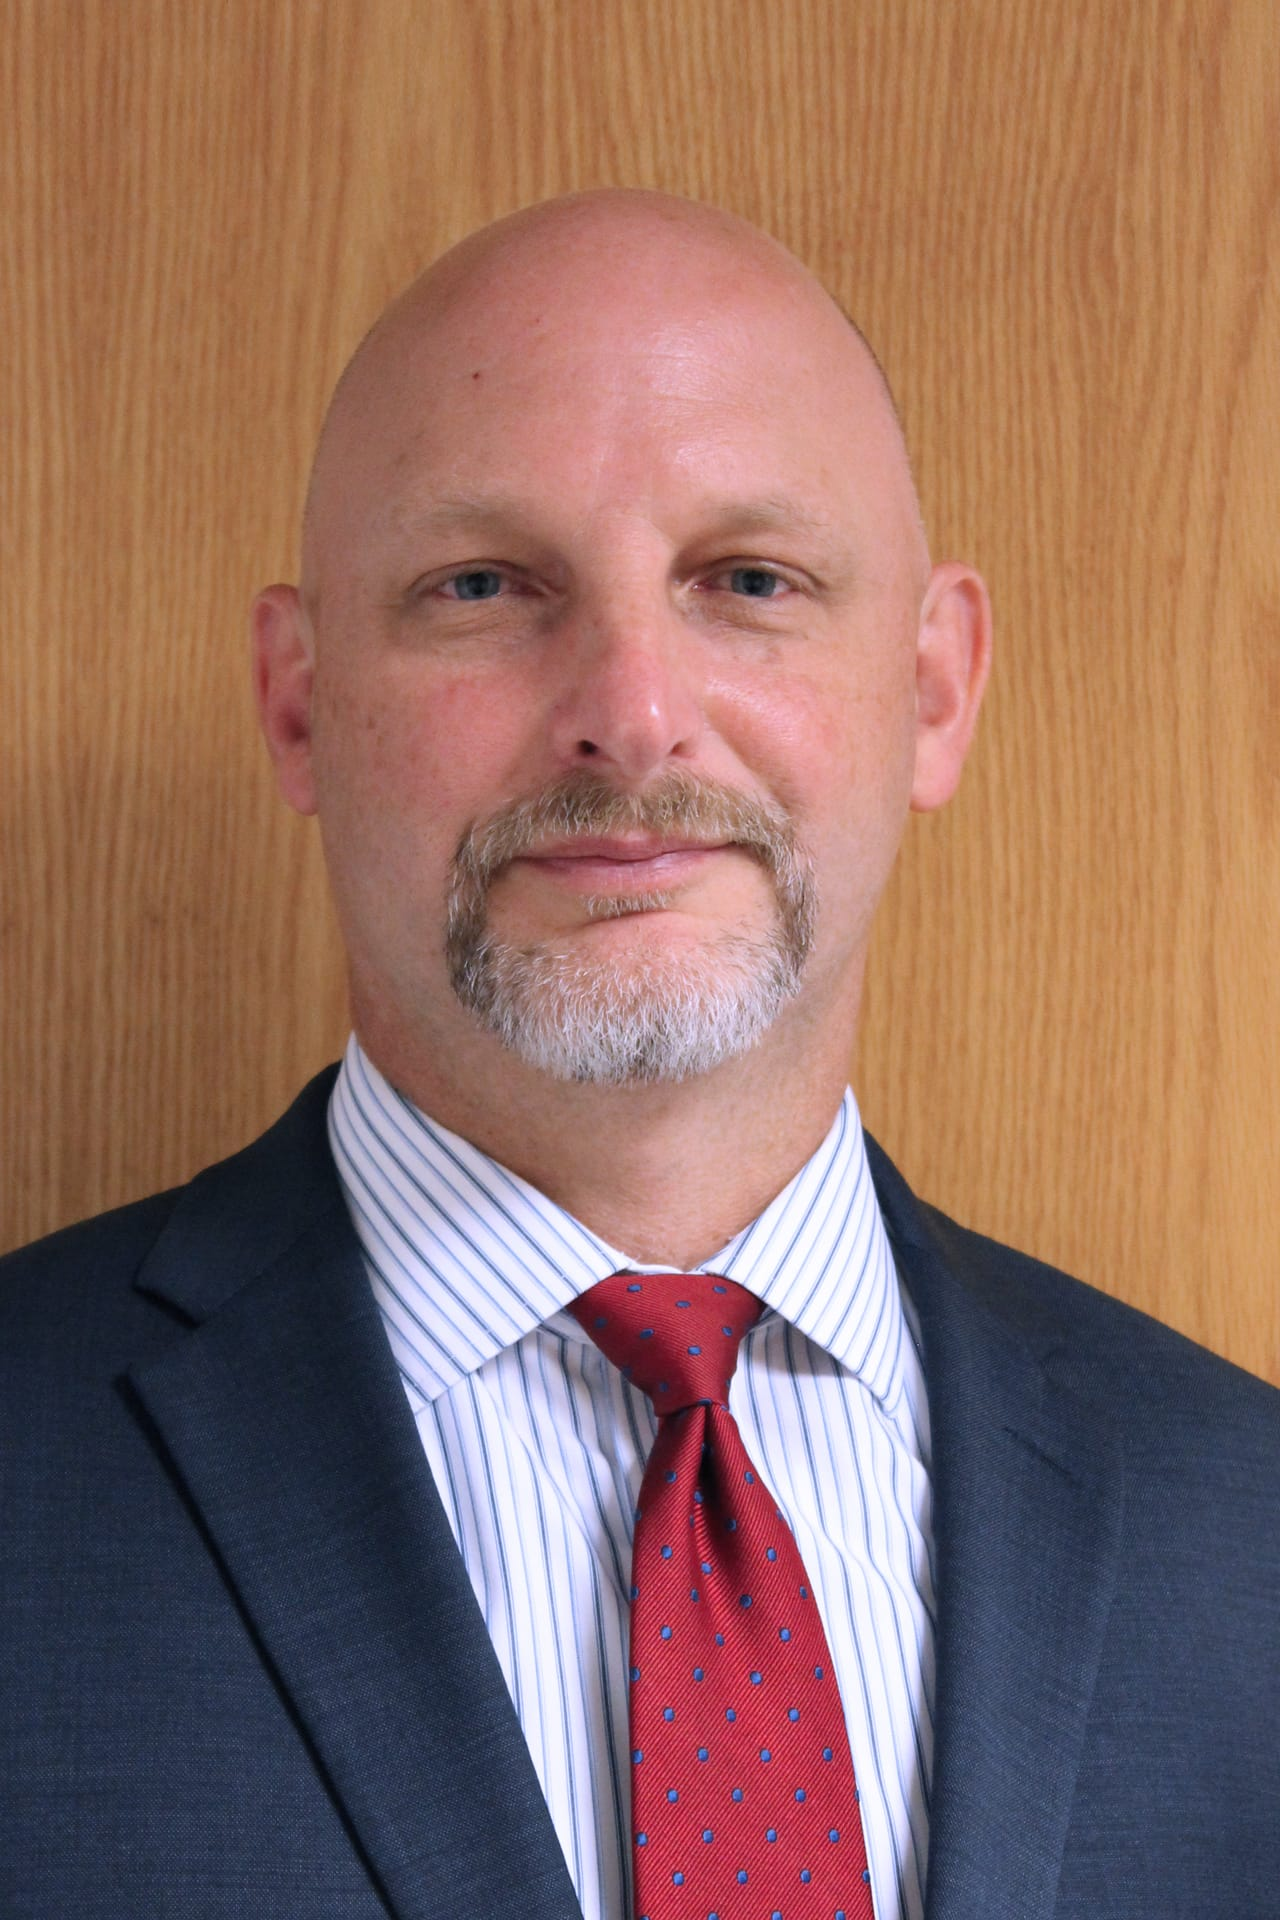 Dave Fechter